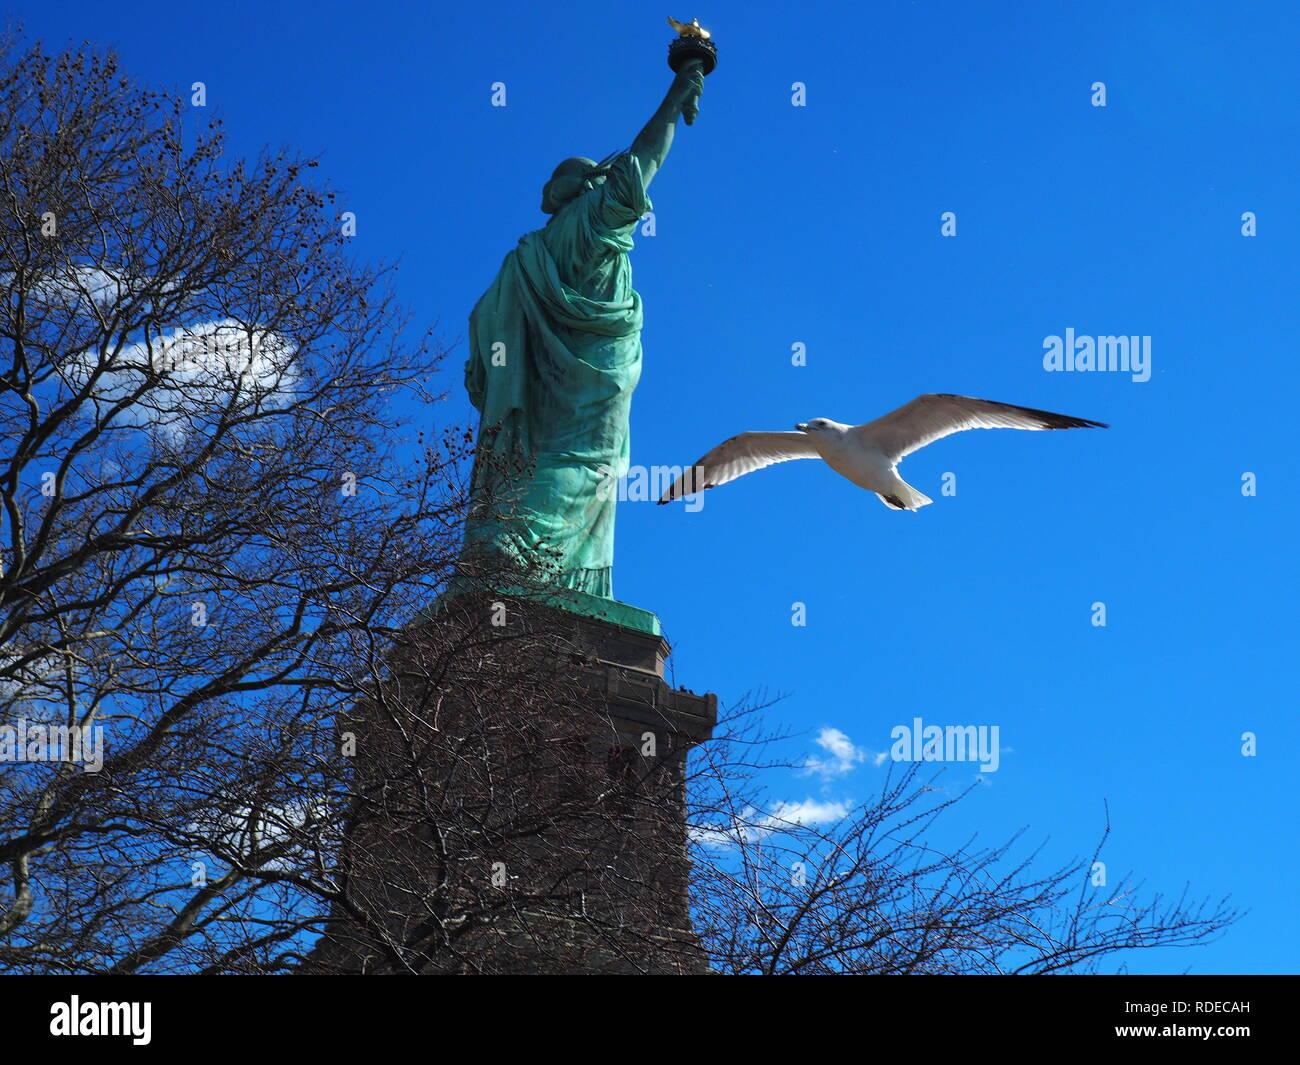 Statue of Liberty - New York - Stock Image